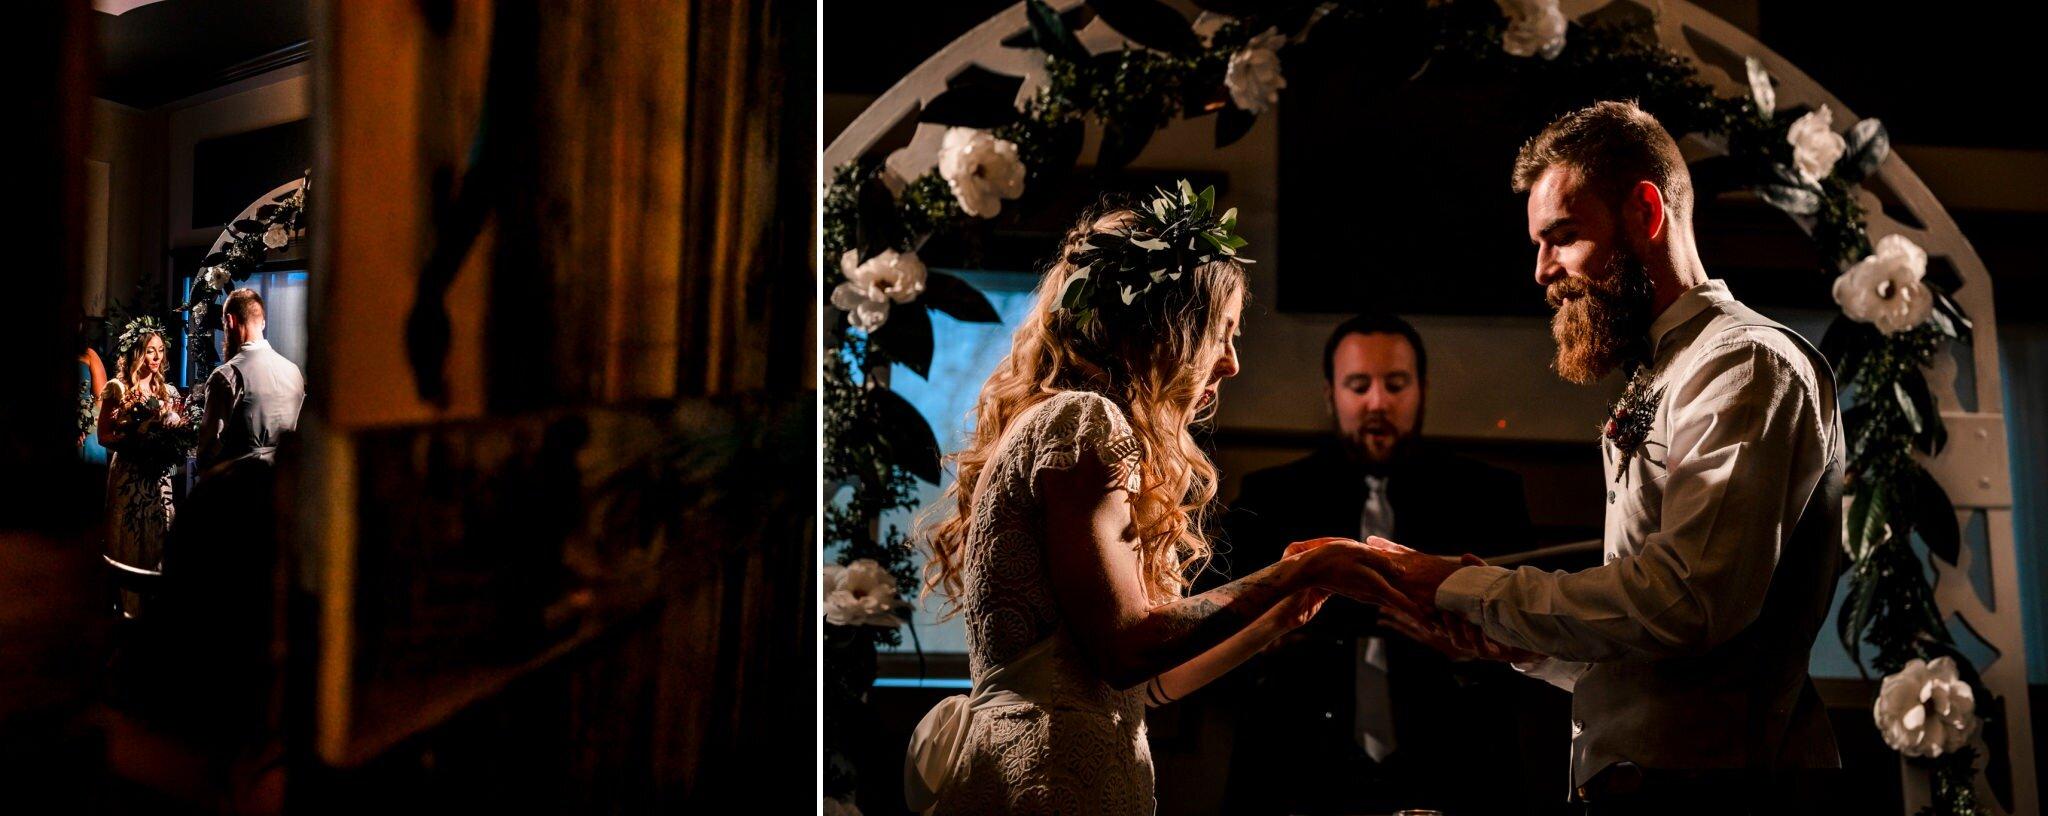 Hoffman-618-New-Jersey-Wedding-Photographer-62.JPG